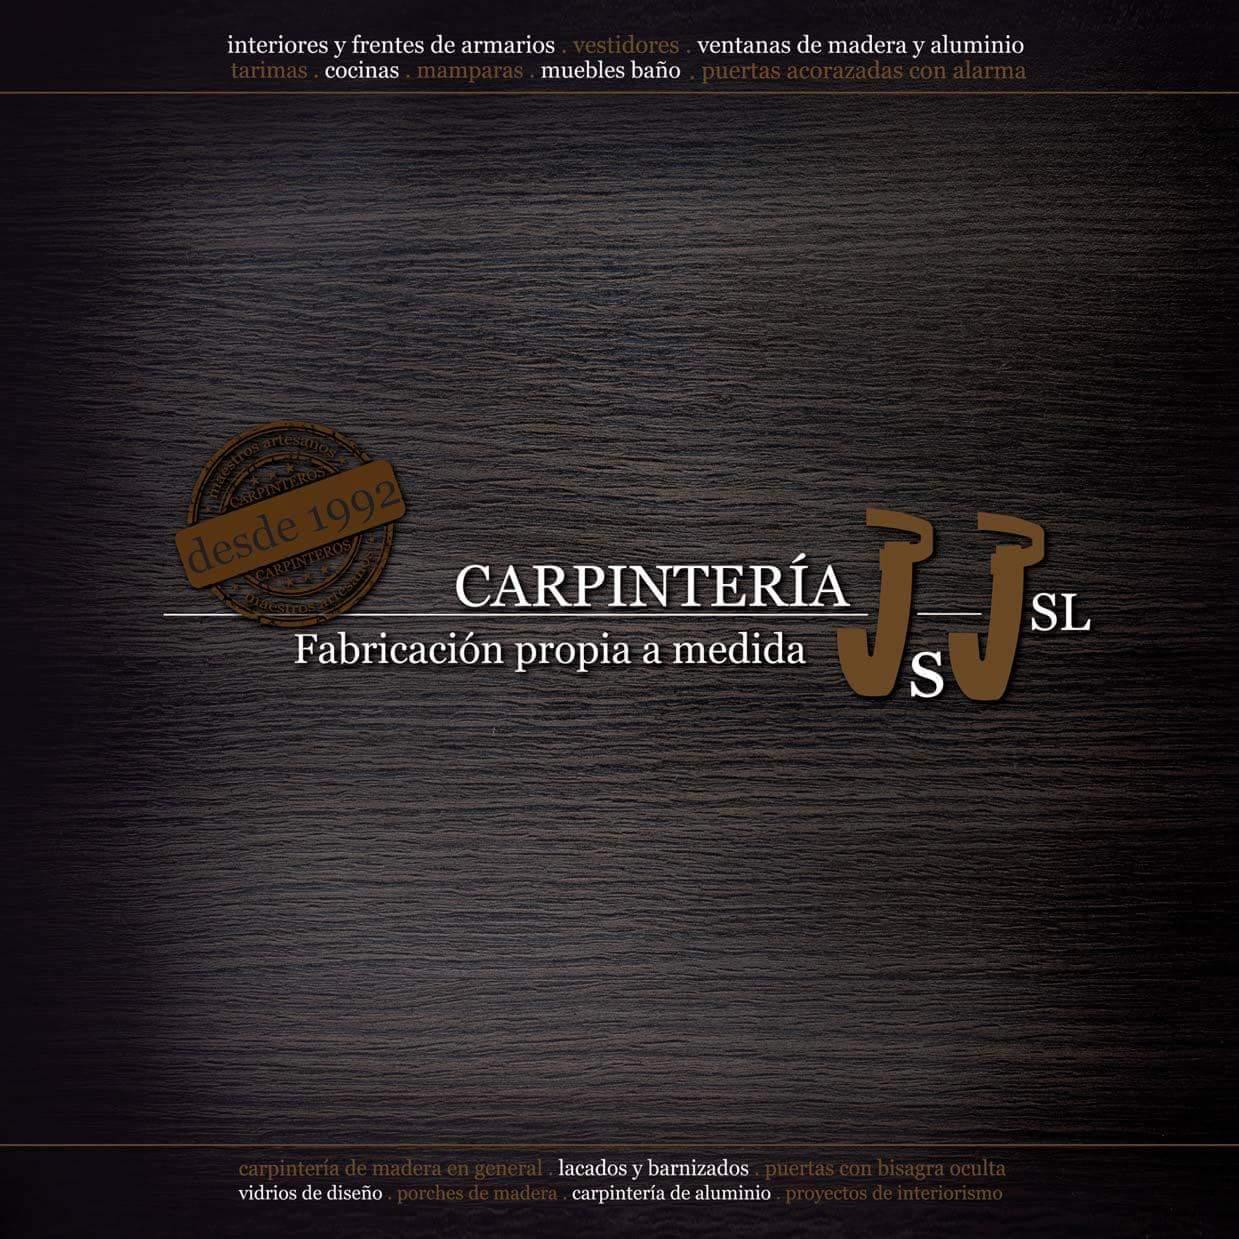 Carpintería J.s.j. S.l.